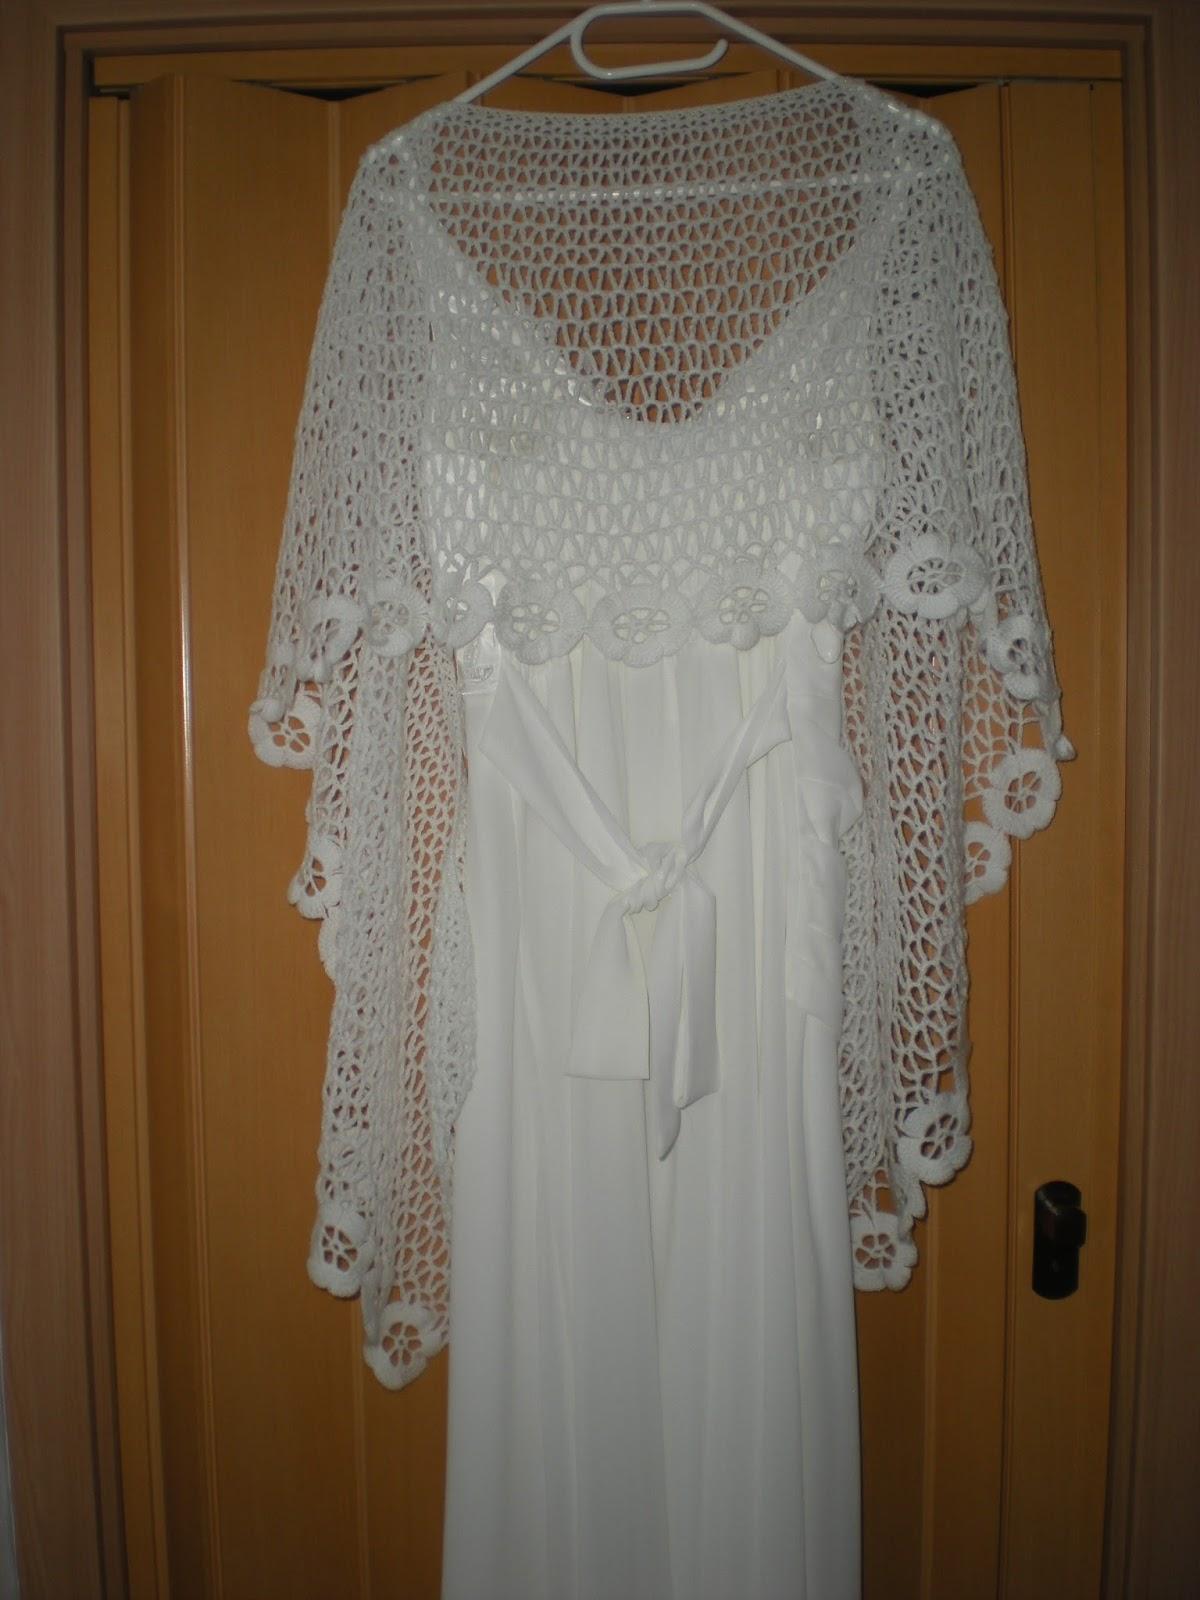 emmhouse wedding shawl pattern. Black Bedroom Furniture Sets. Home Design Ideas